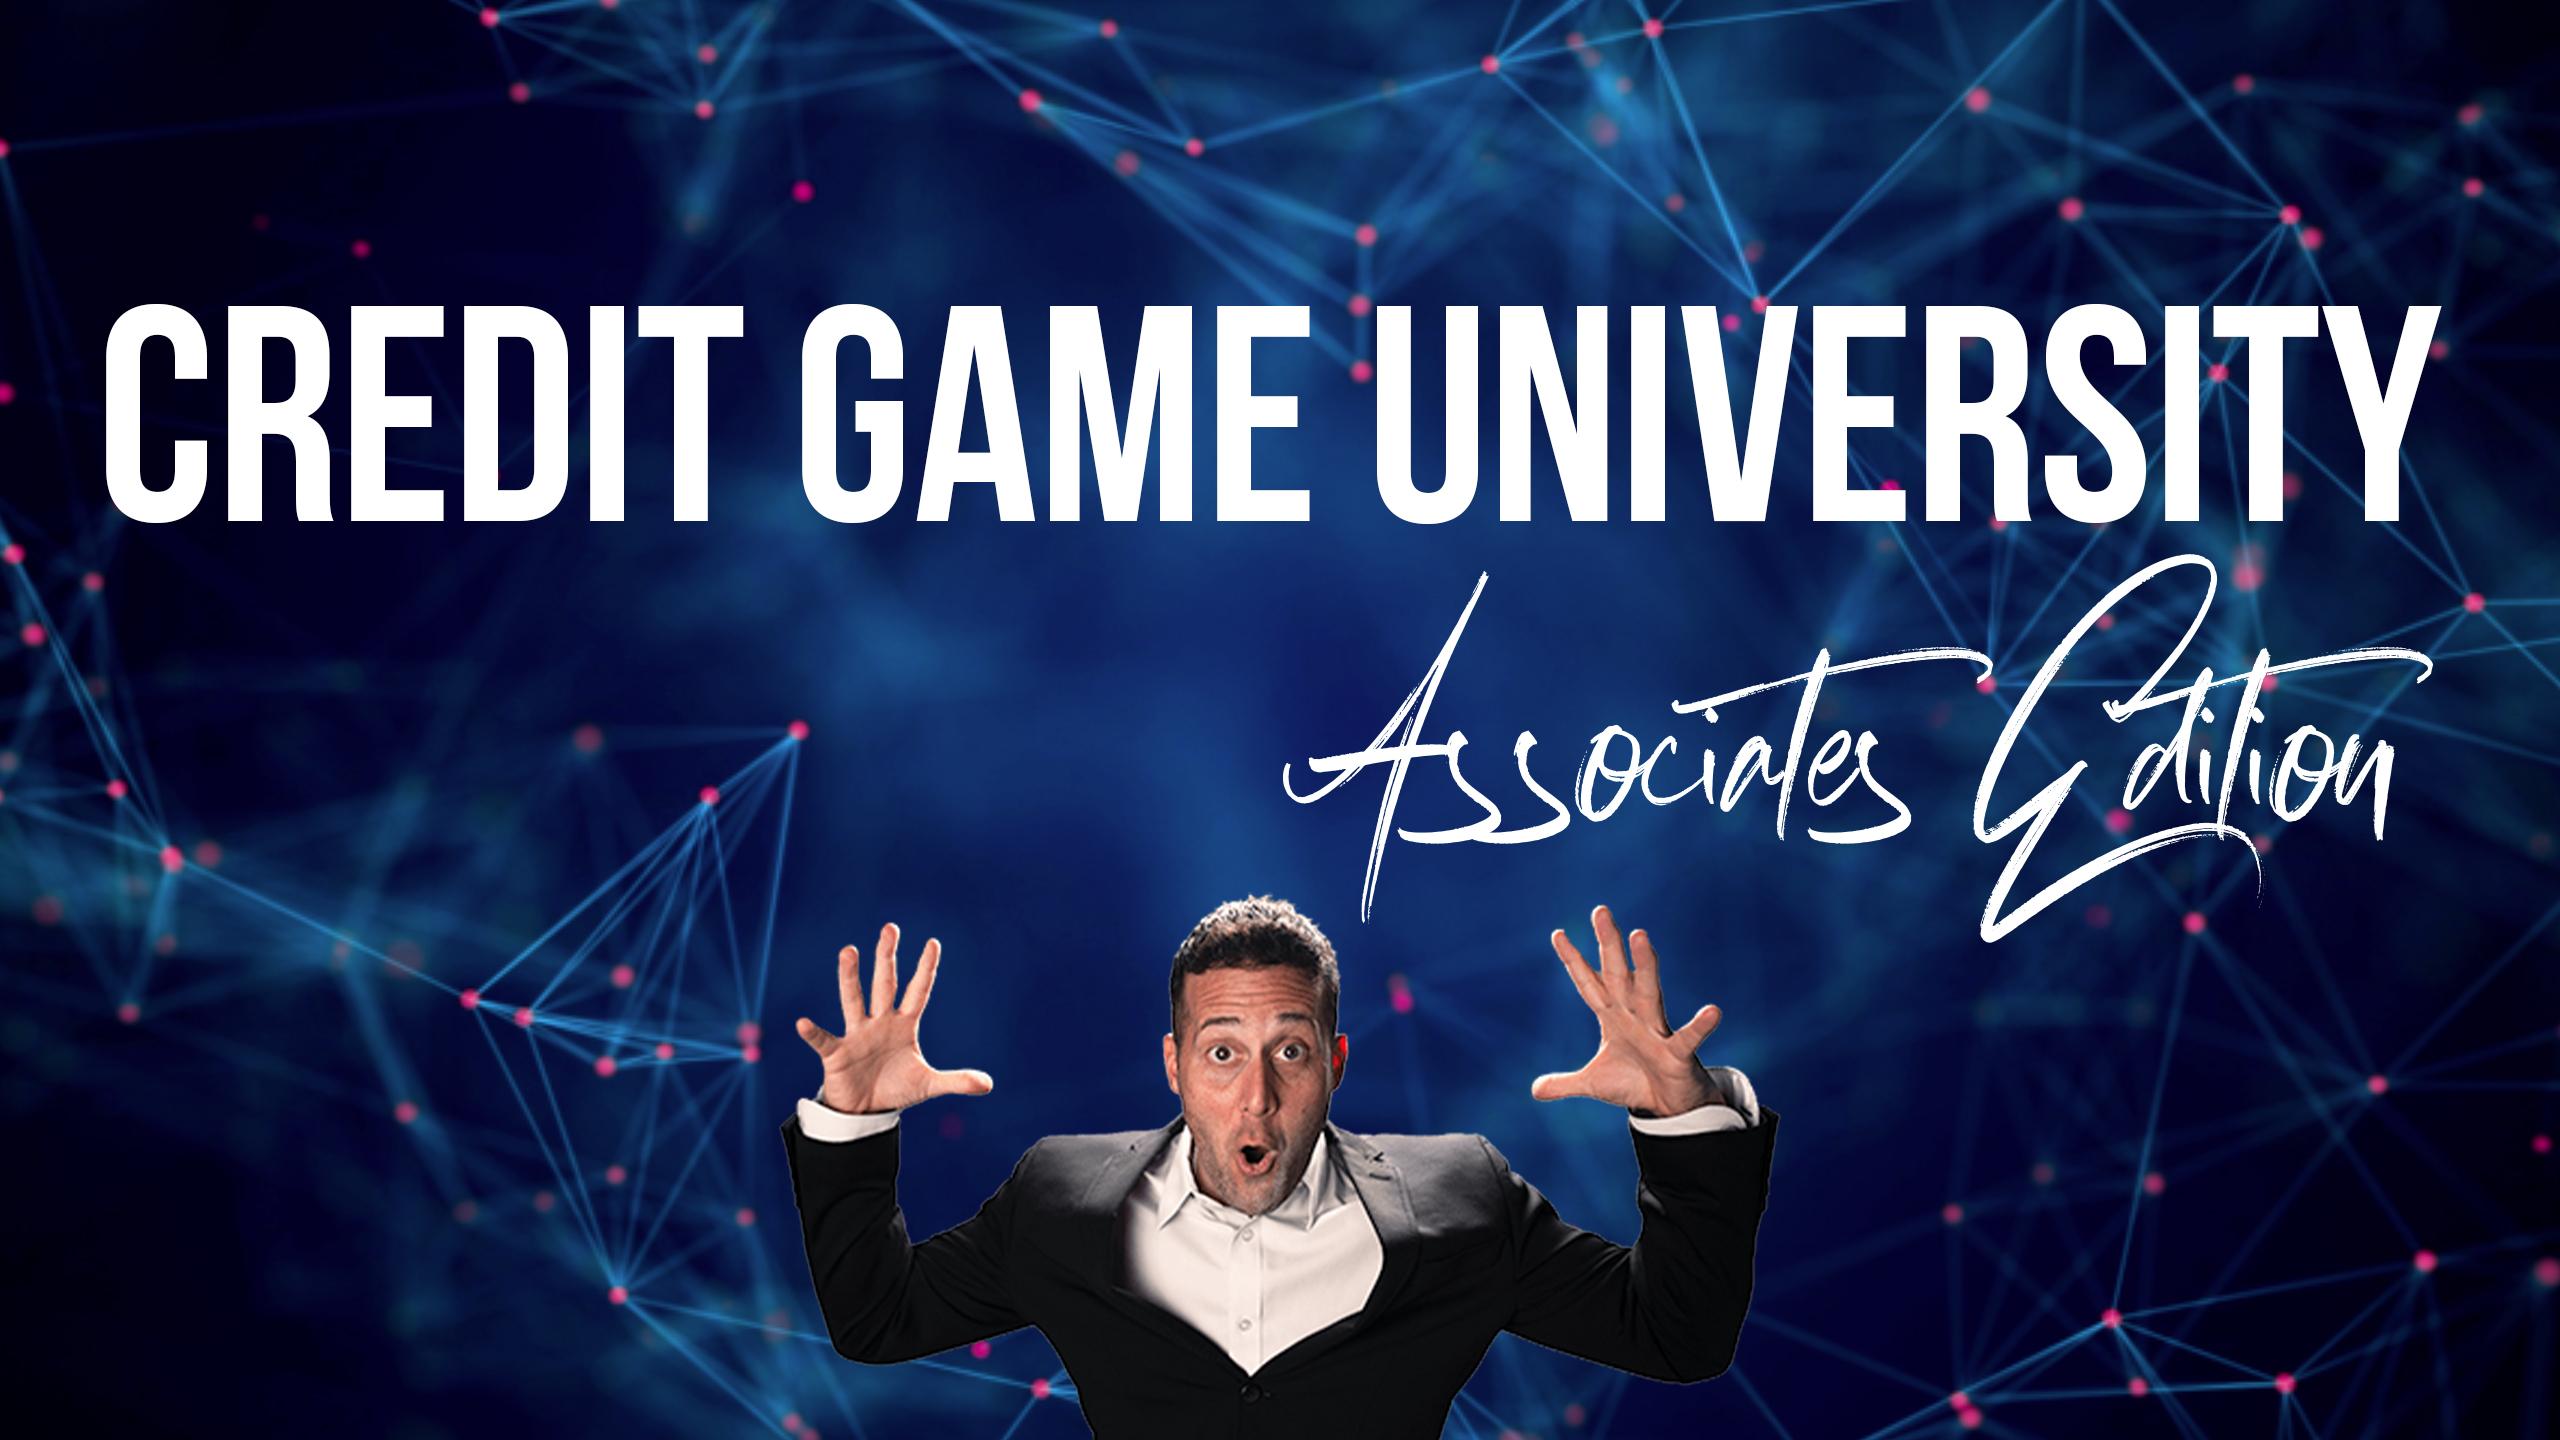 Credit Game University Associates Edition